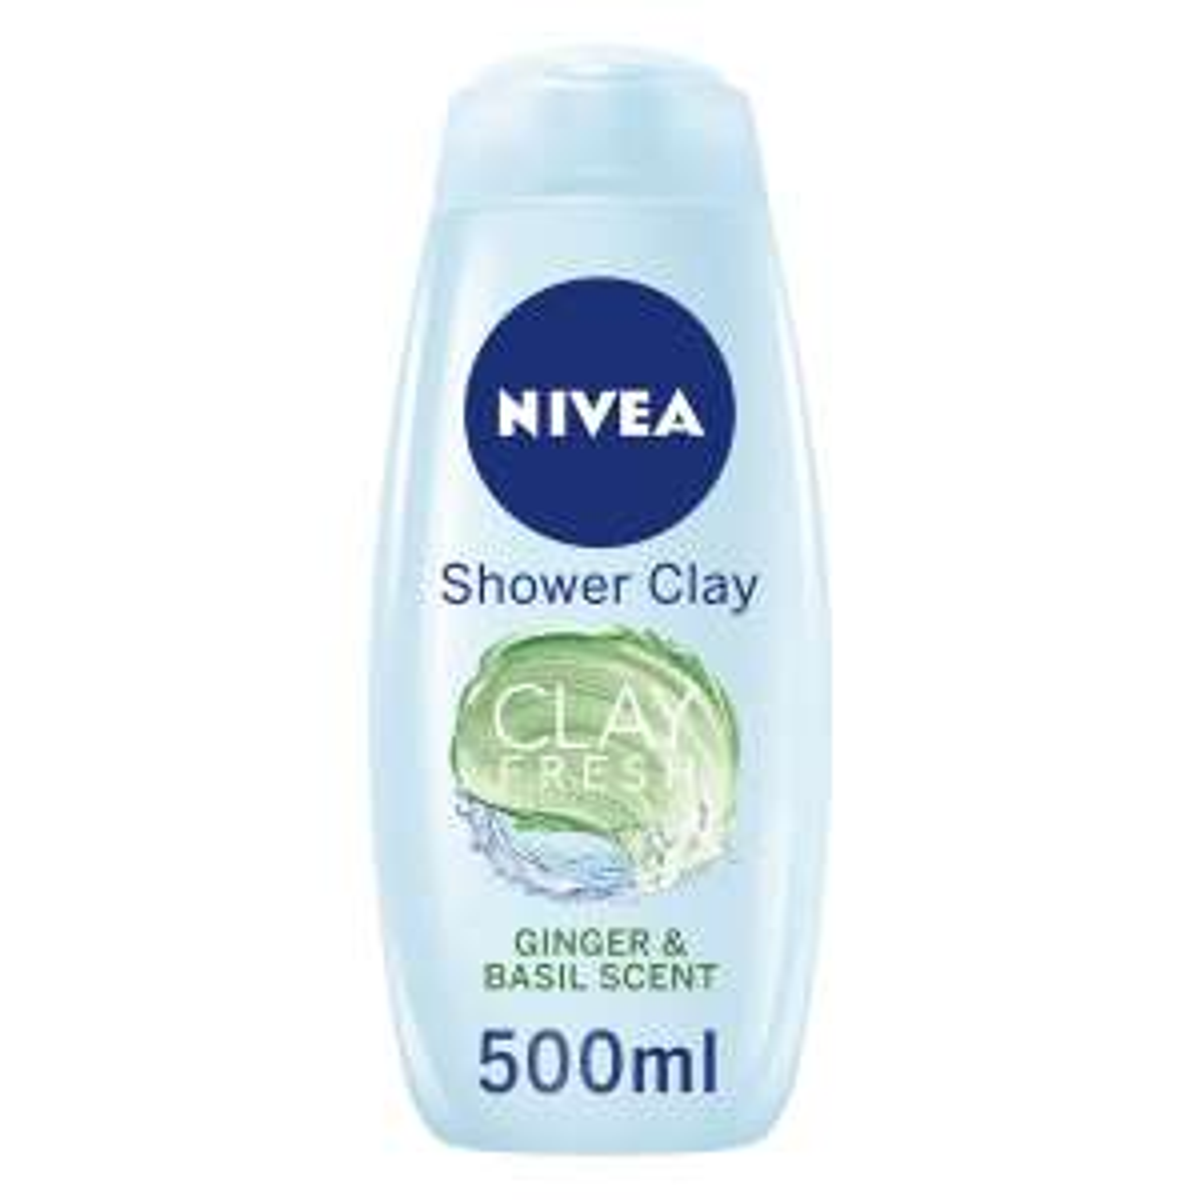 Nivea Shower Clay Fresh Ginger & Basil 500Ml Pack of 6 (£4.80) - Min Quantity 2 - Total £9.60 @ Amazon(+£4.49 non Prime)